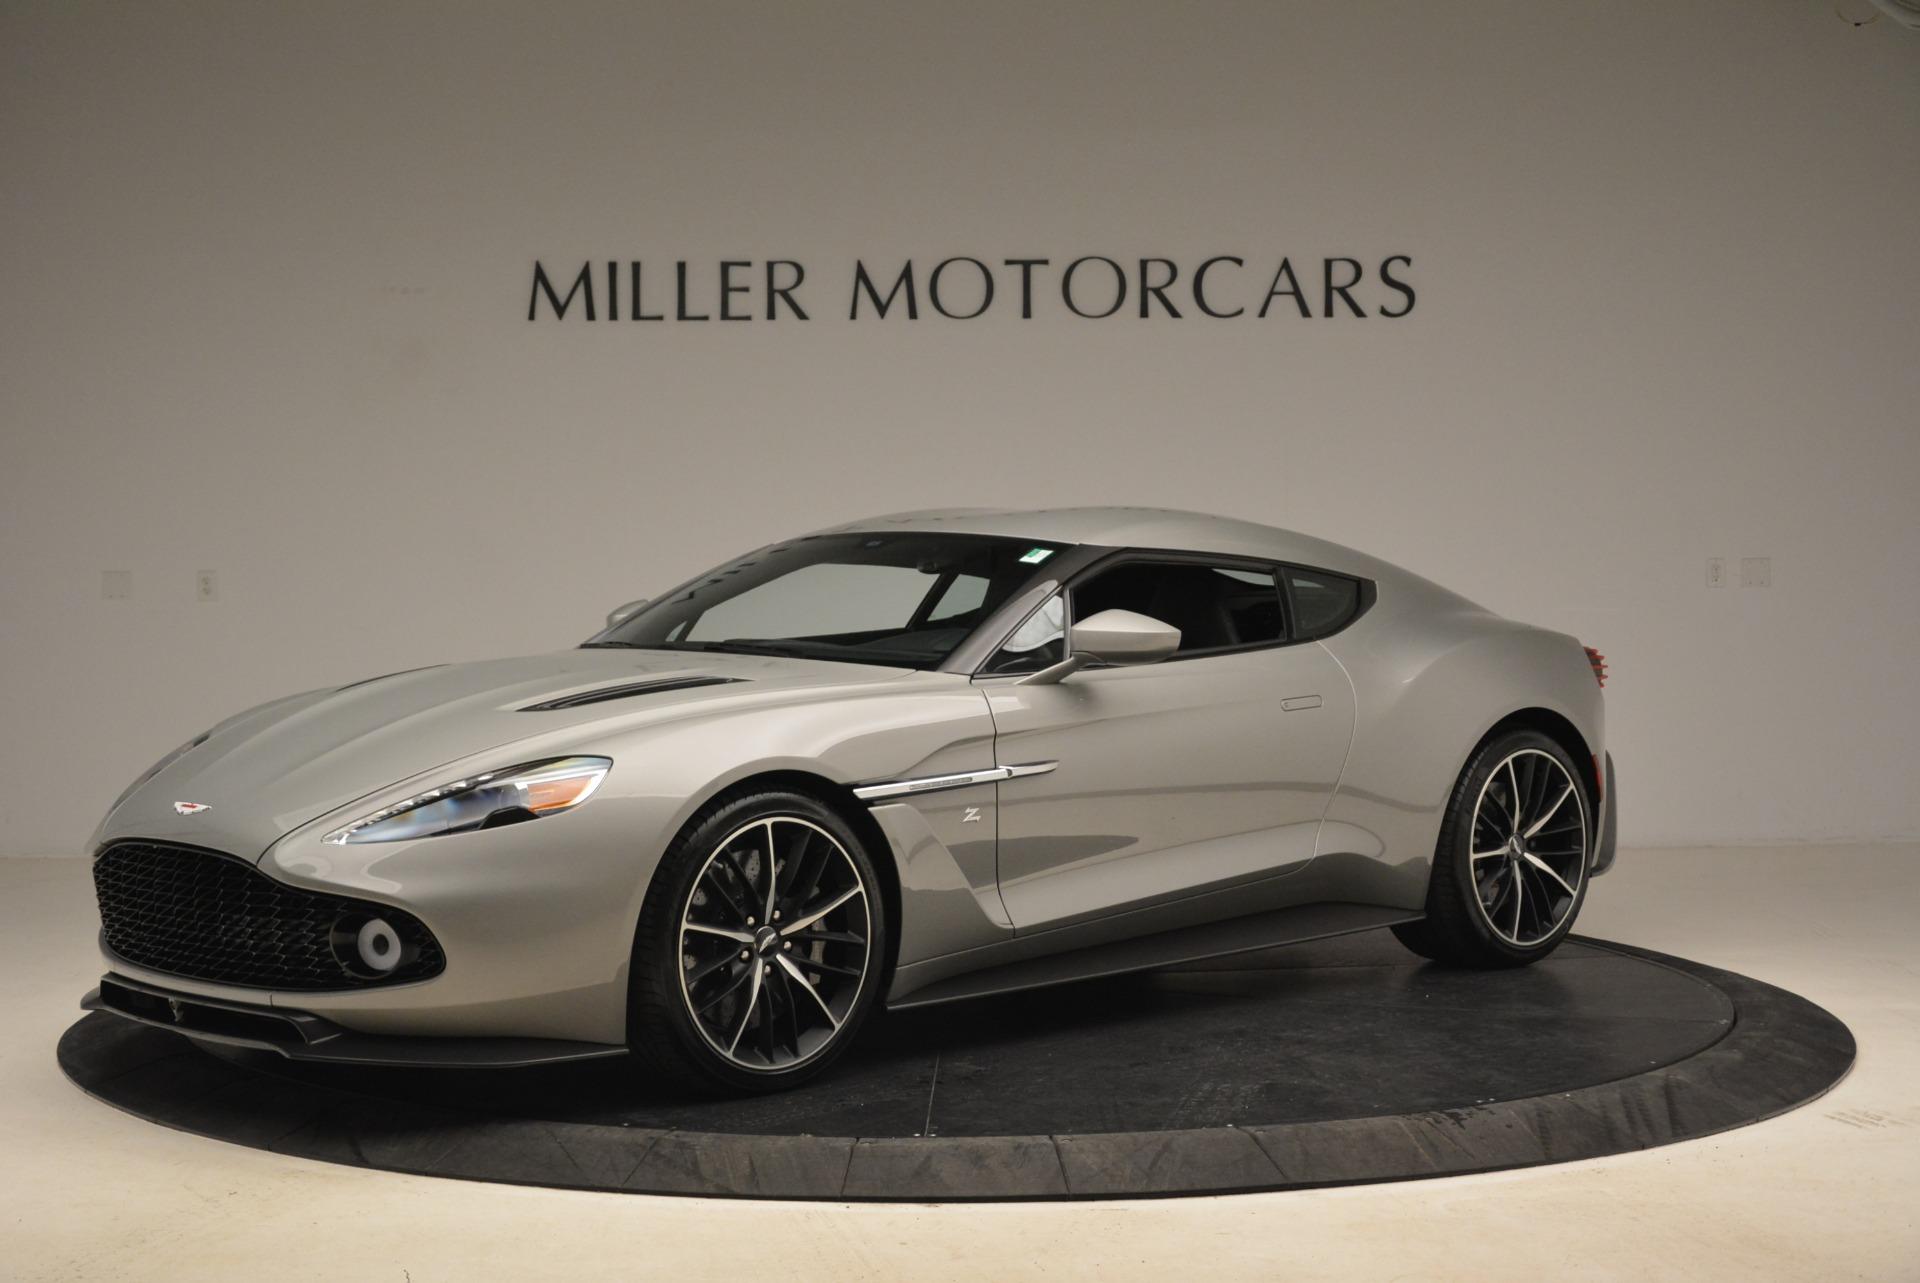 Pre Owned 2018 Aston Martin Vanquish Zagato For Sale Miller Motorcars Stock 7346c